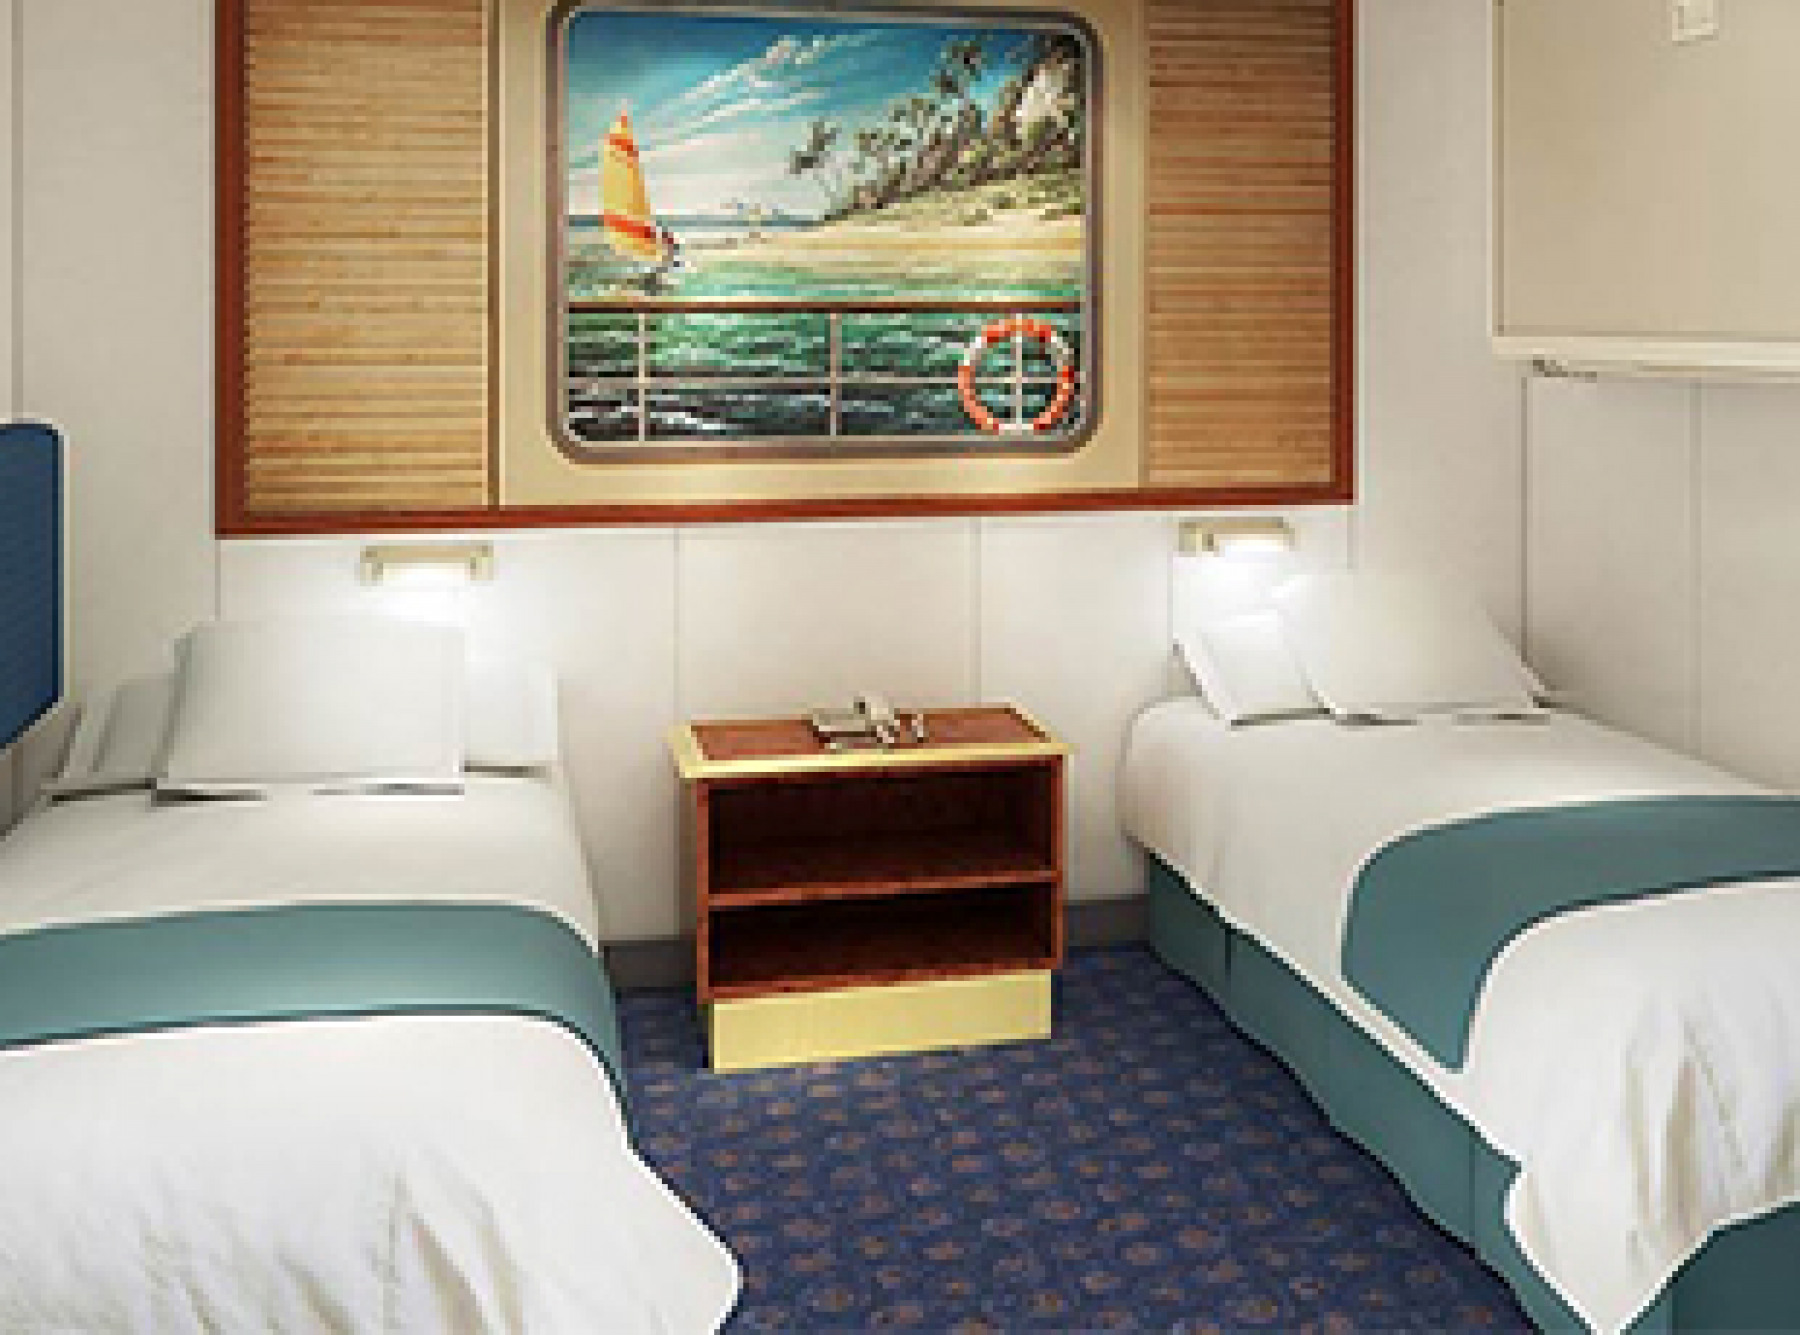 Norwegian Cruise Line Norwegian Spirit Accommodation Inside.jpg